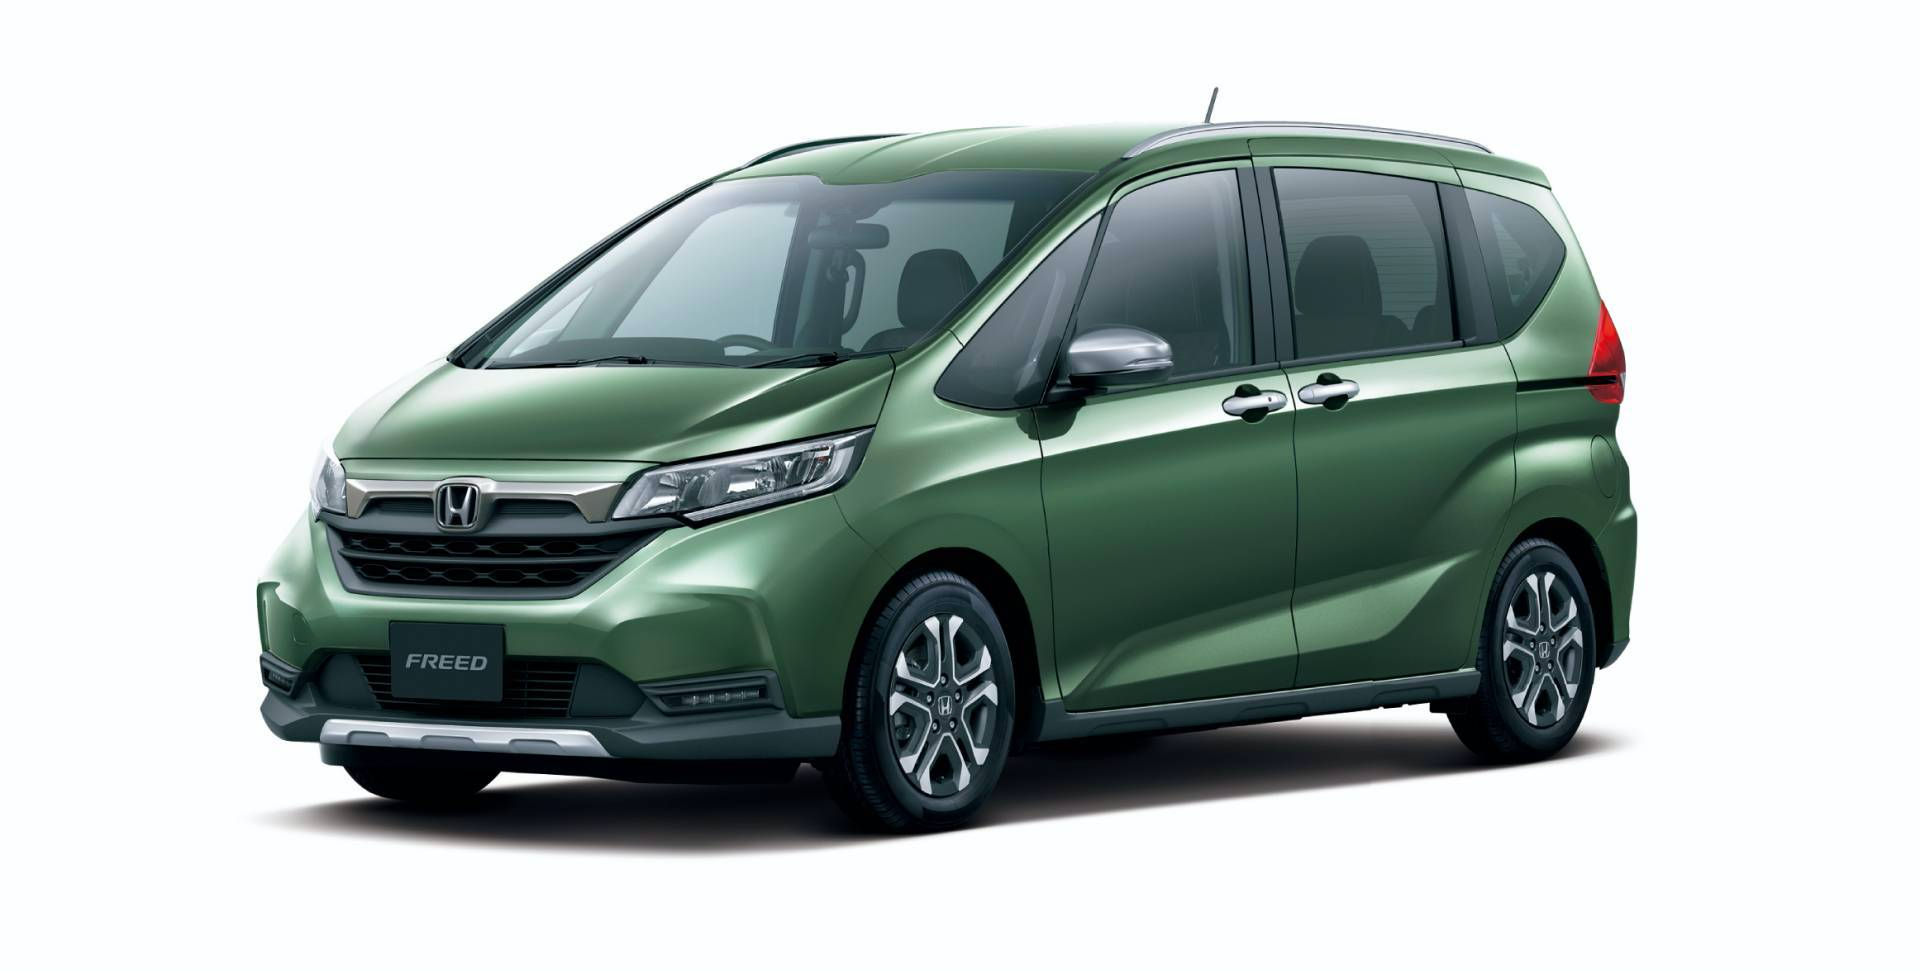 Honda-Freed-2020-10